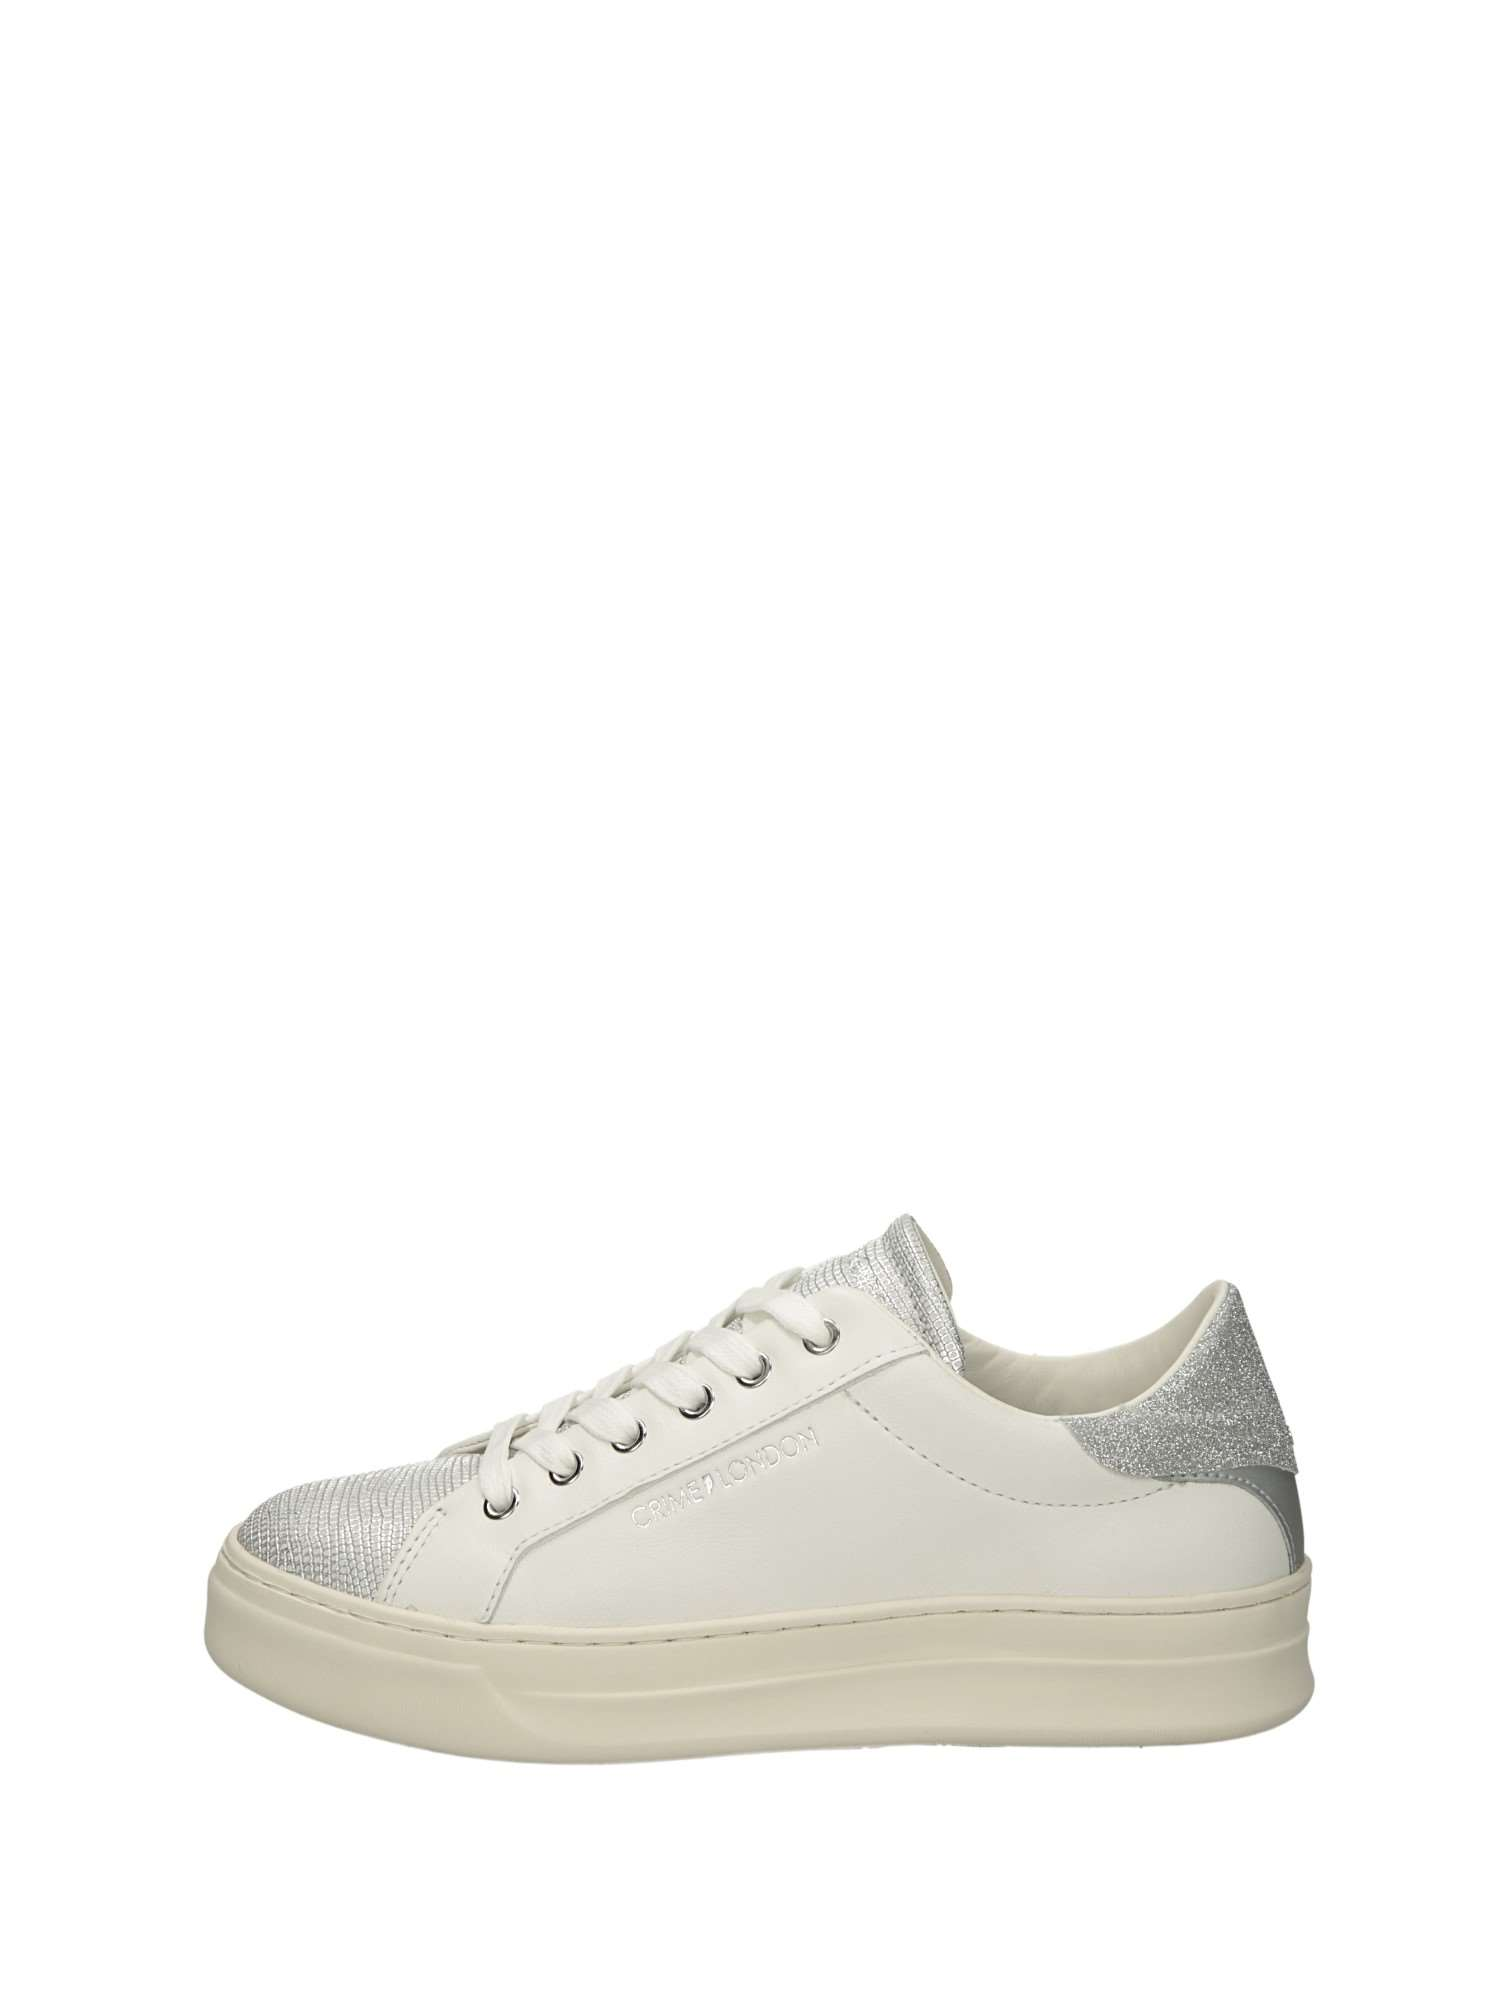 Crime Blanc Wehid29 Basse Argentfemme London Sneakers 50 m80vnwN